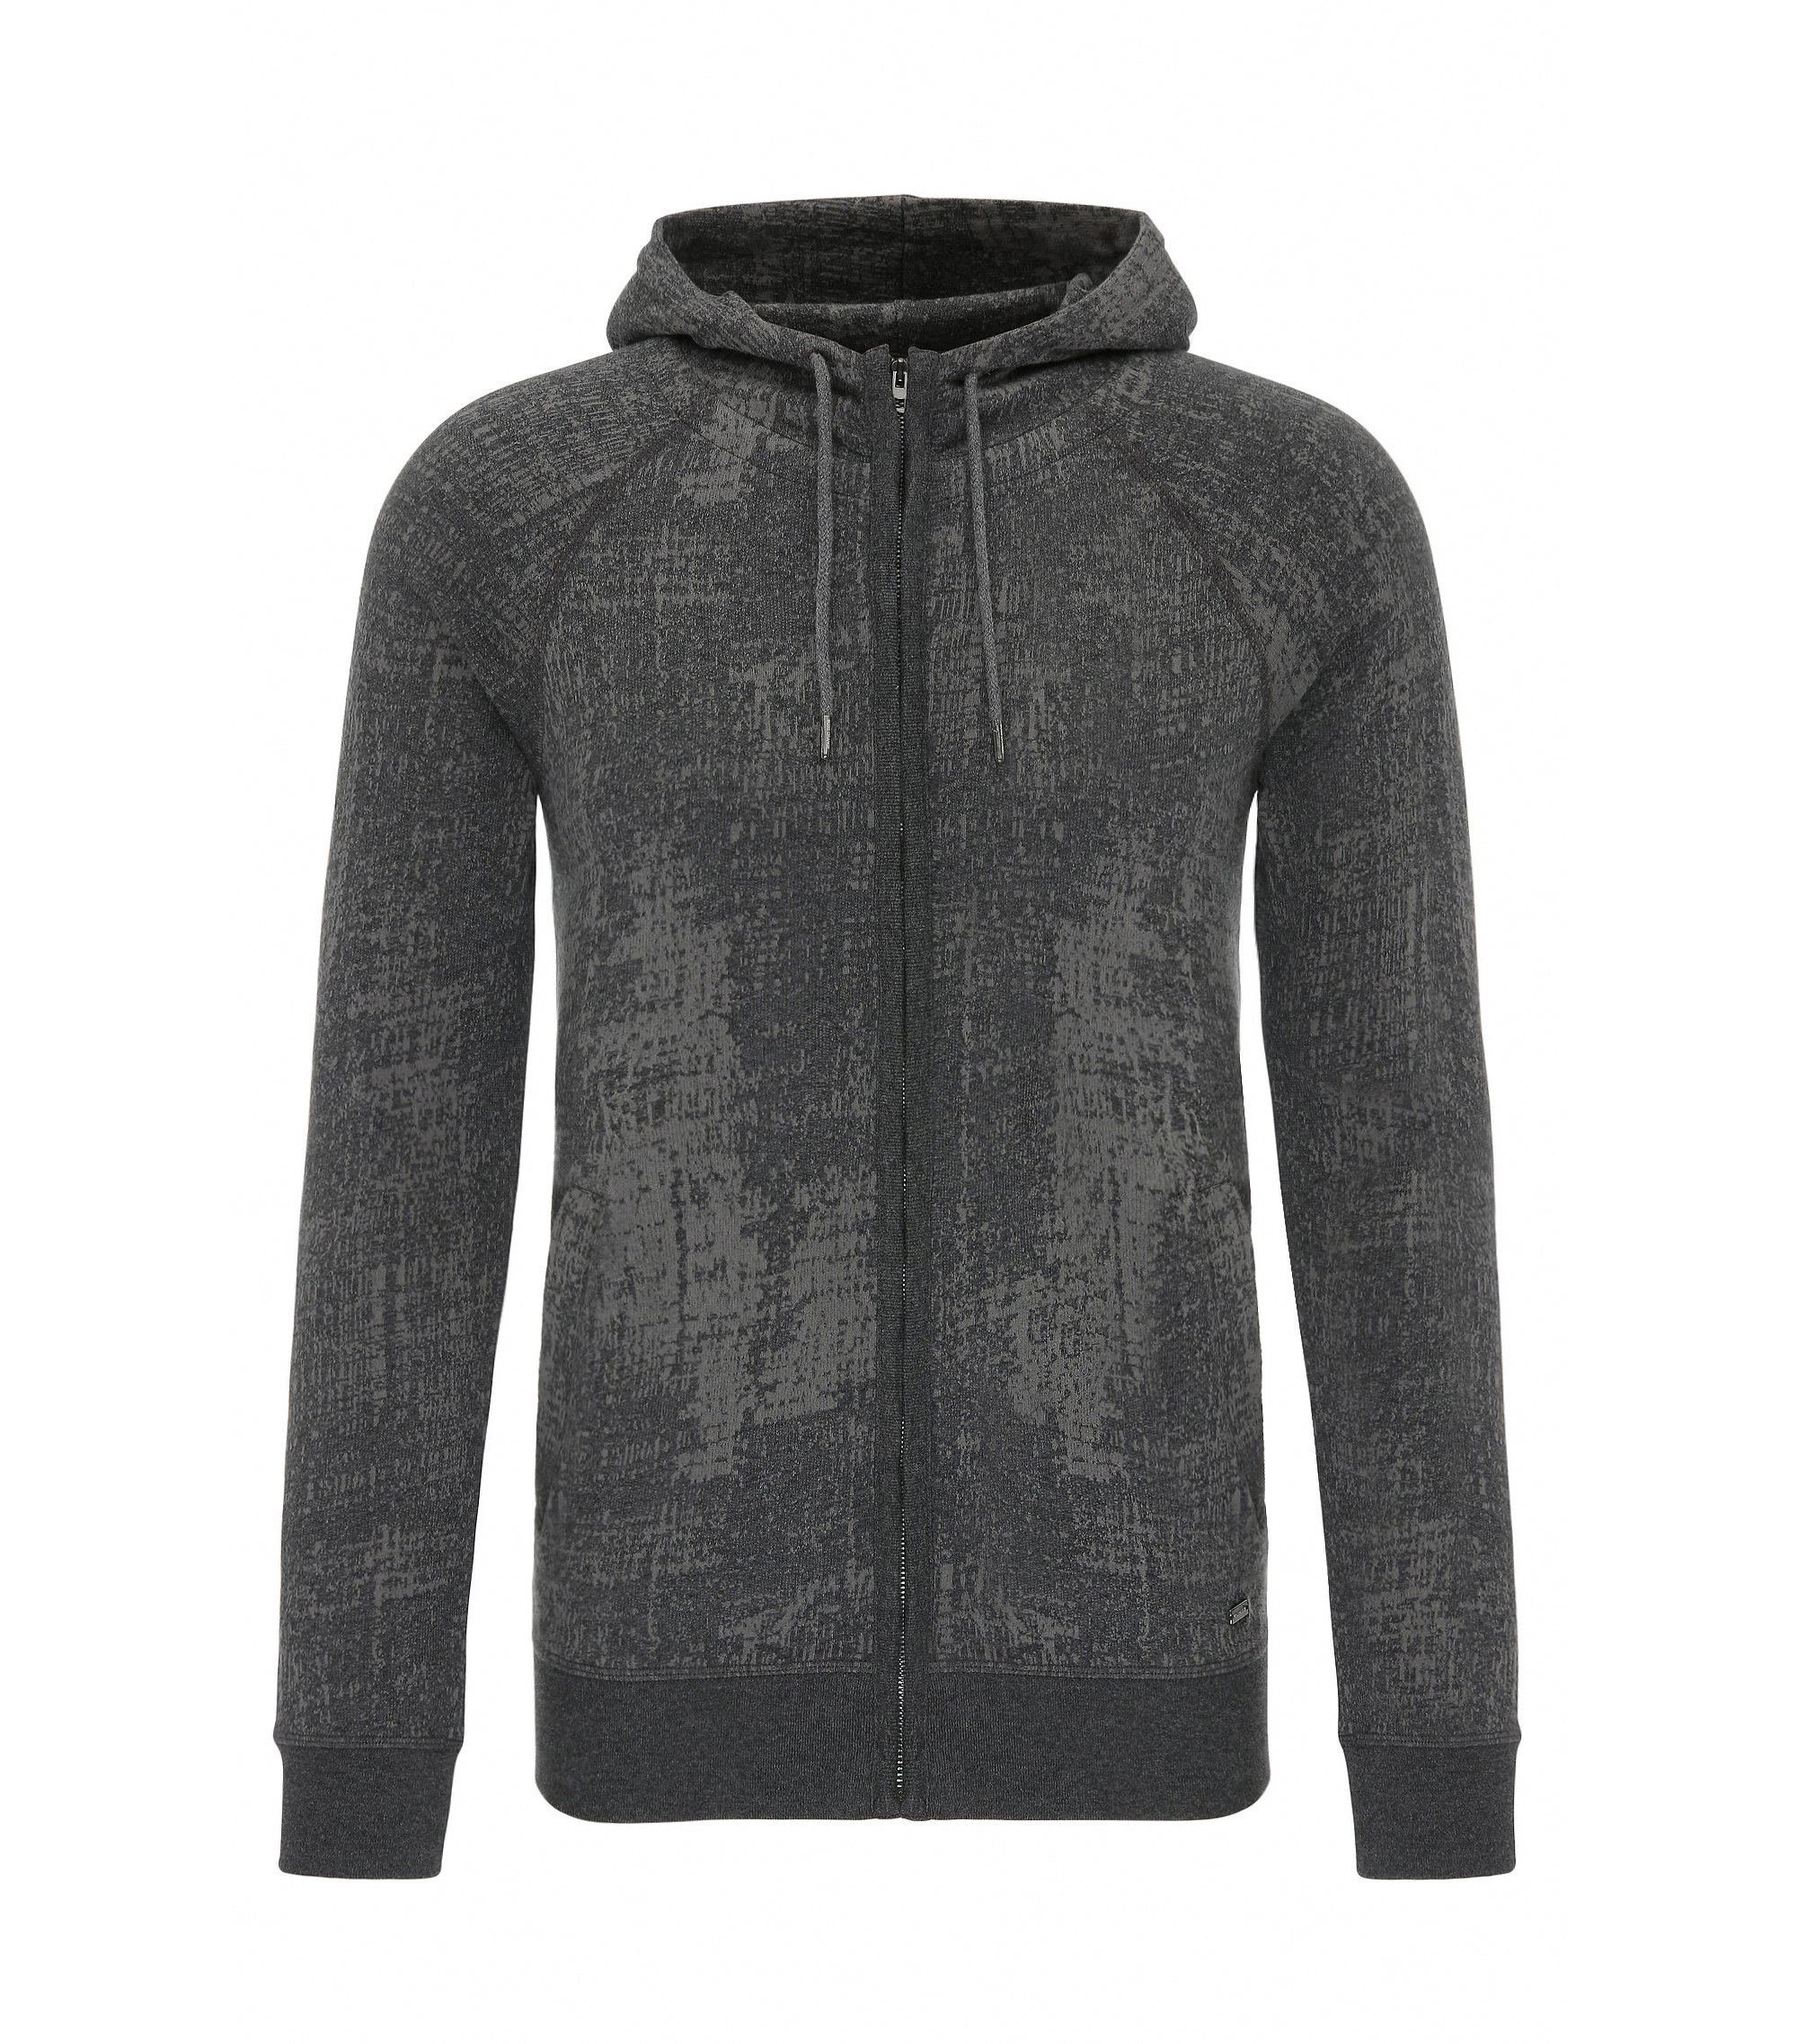 'Zpot' | Slim Fit, Cotton Hooded Sweatshirt, Black